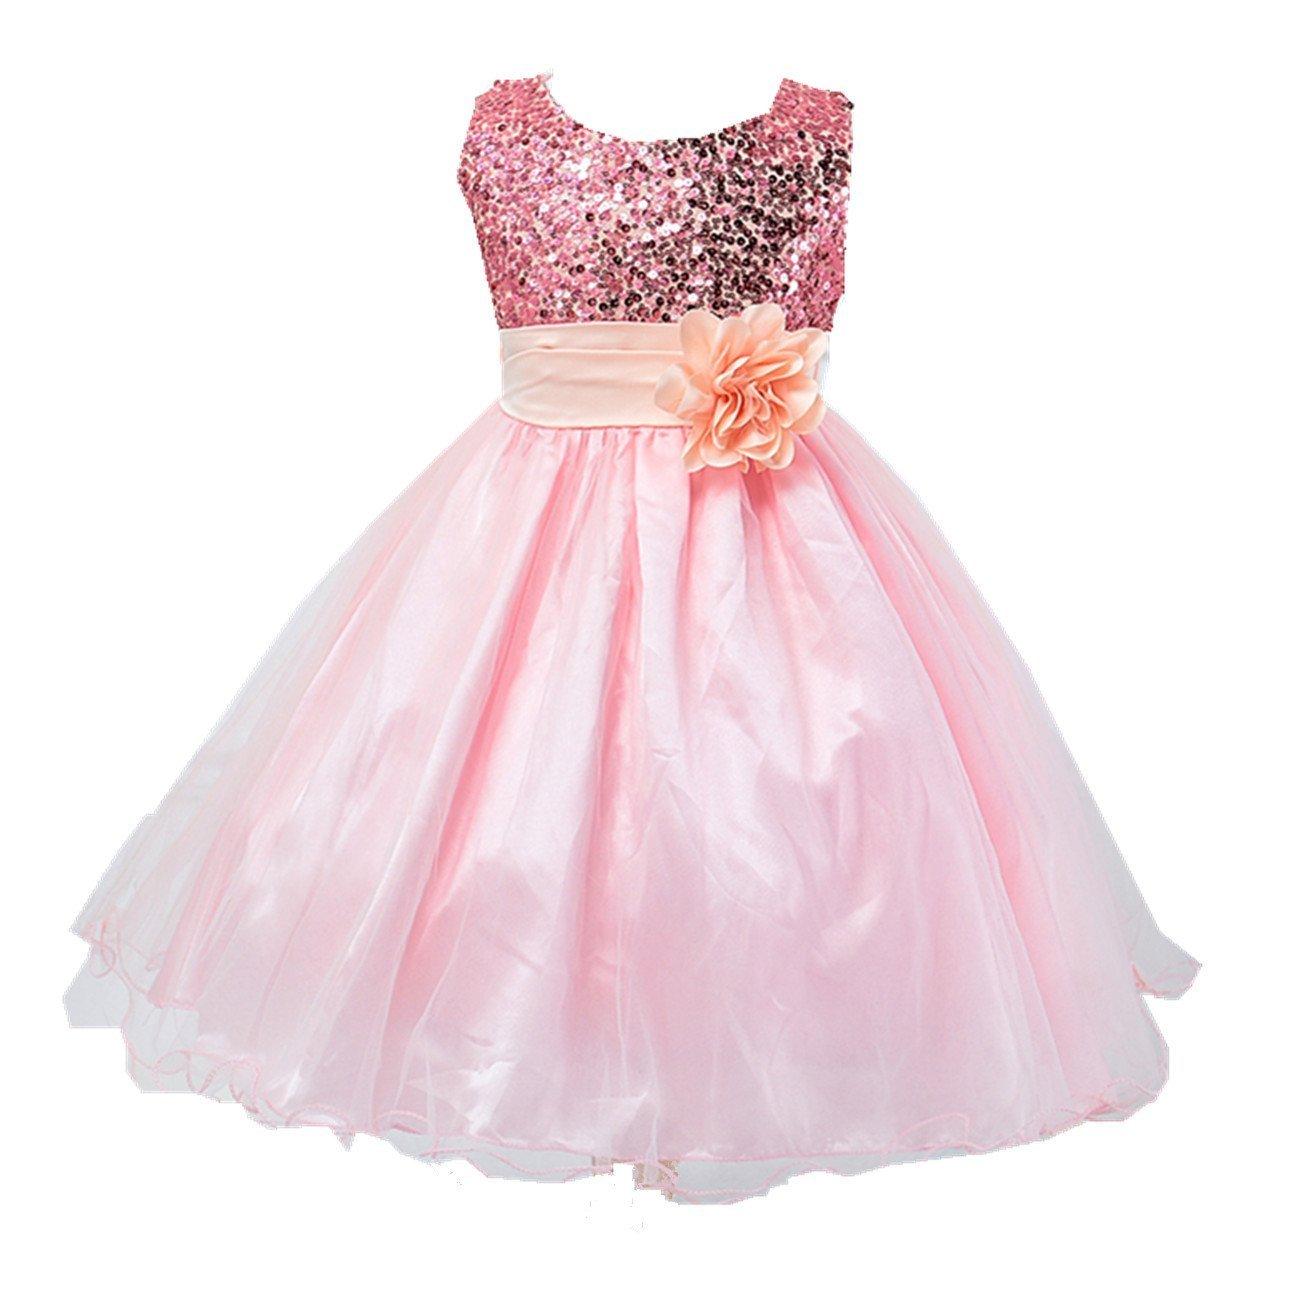 Star Flower Girls Sequin Mesh Party Wedding Princess Tulle Ruffle Dress